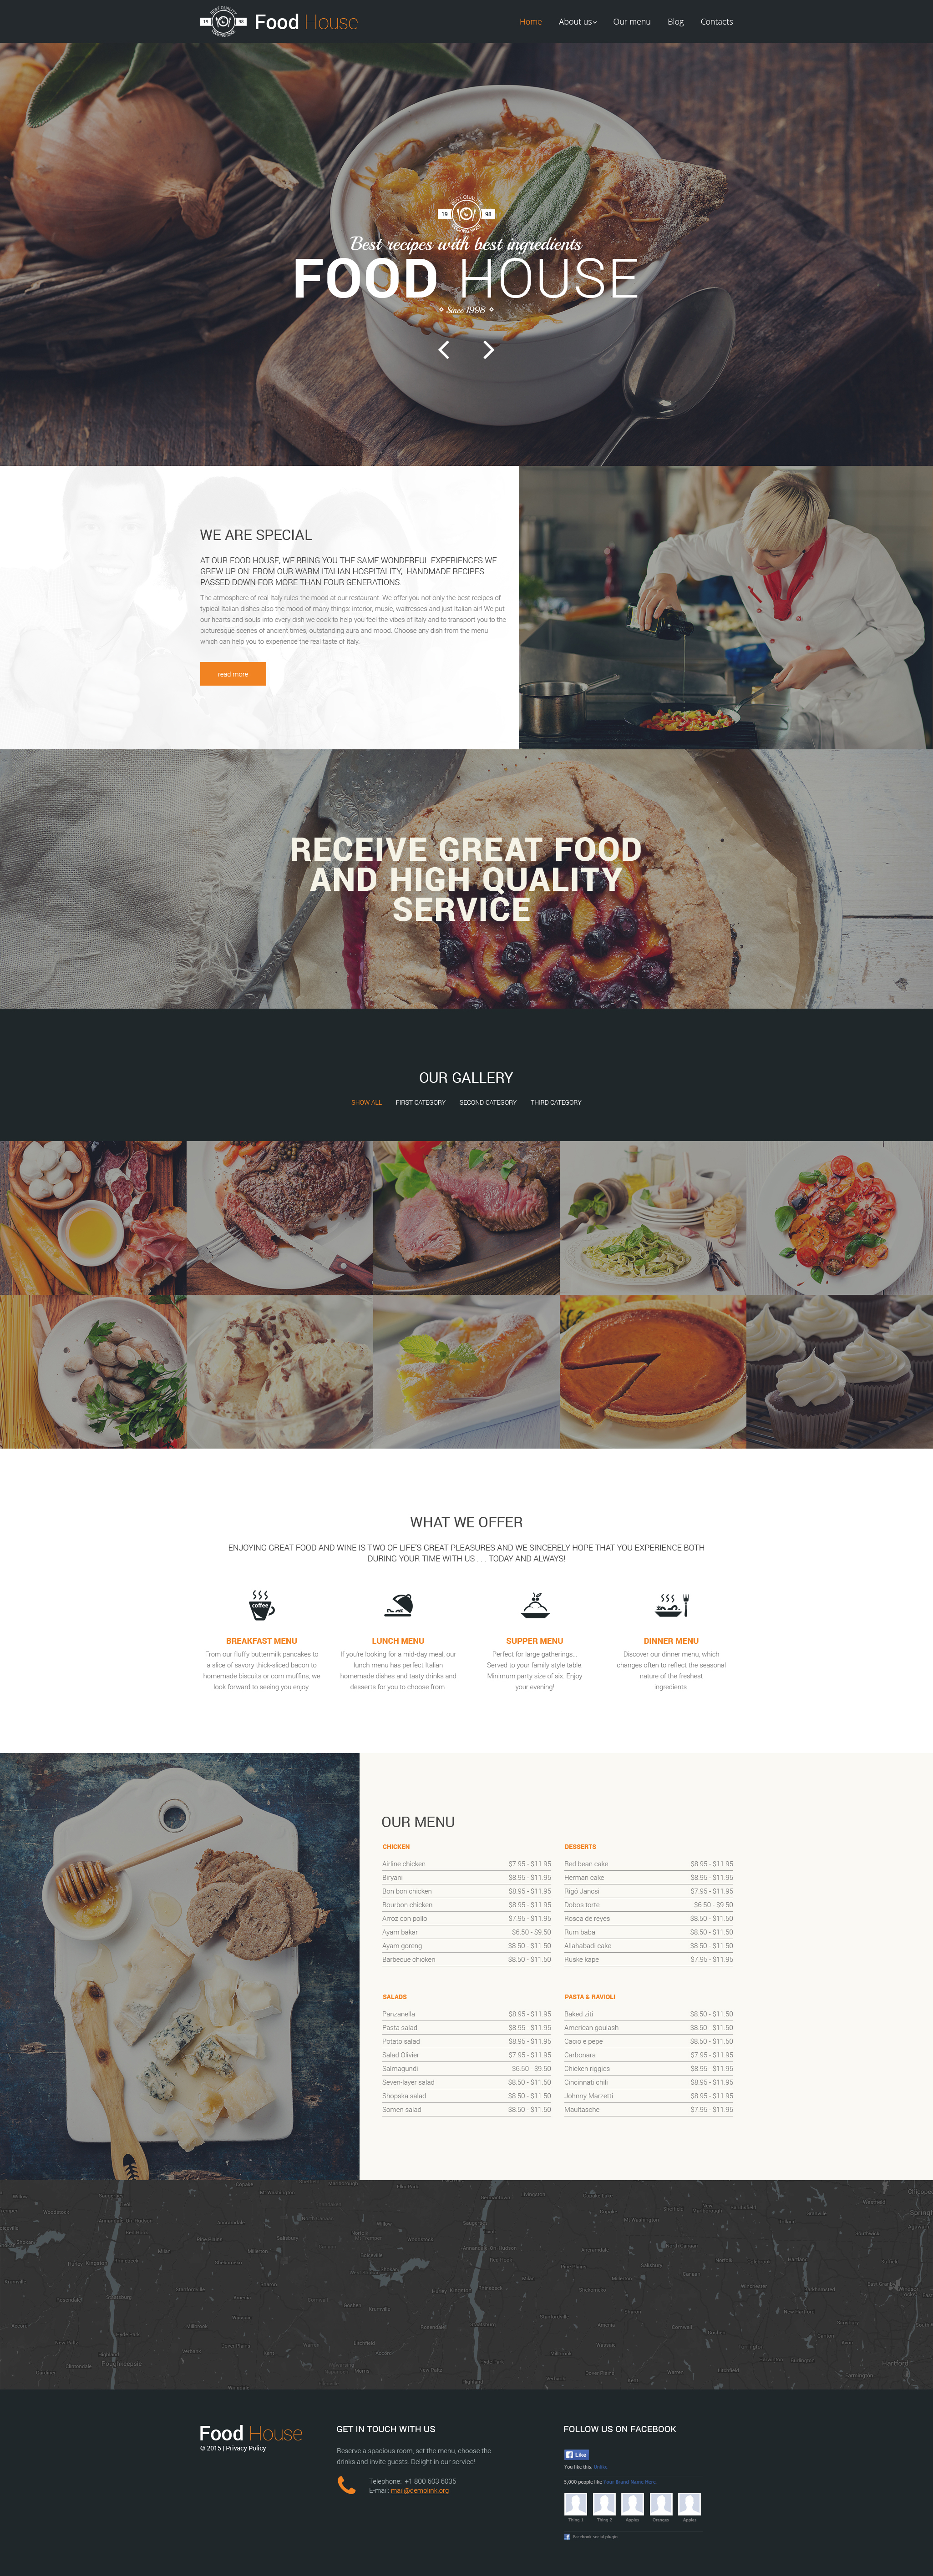 Responsivt Food House Drupal-mall #57611